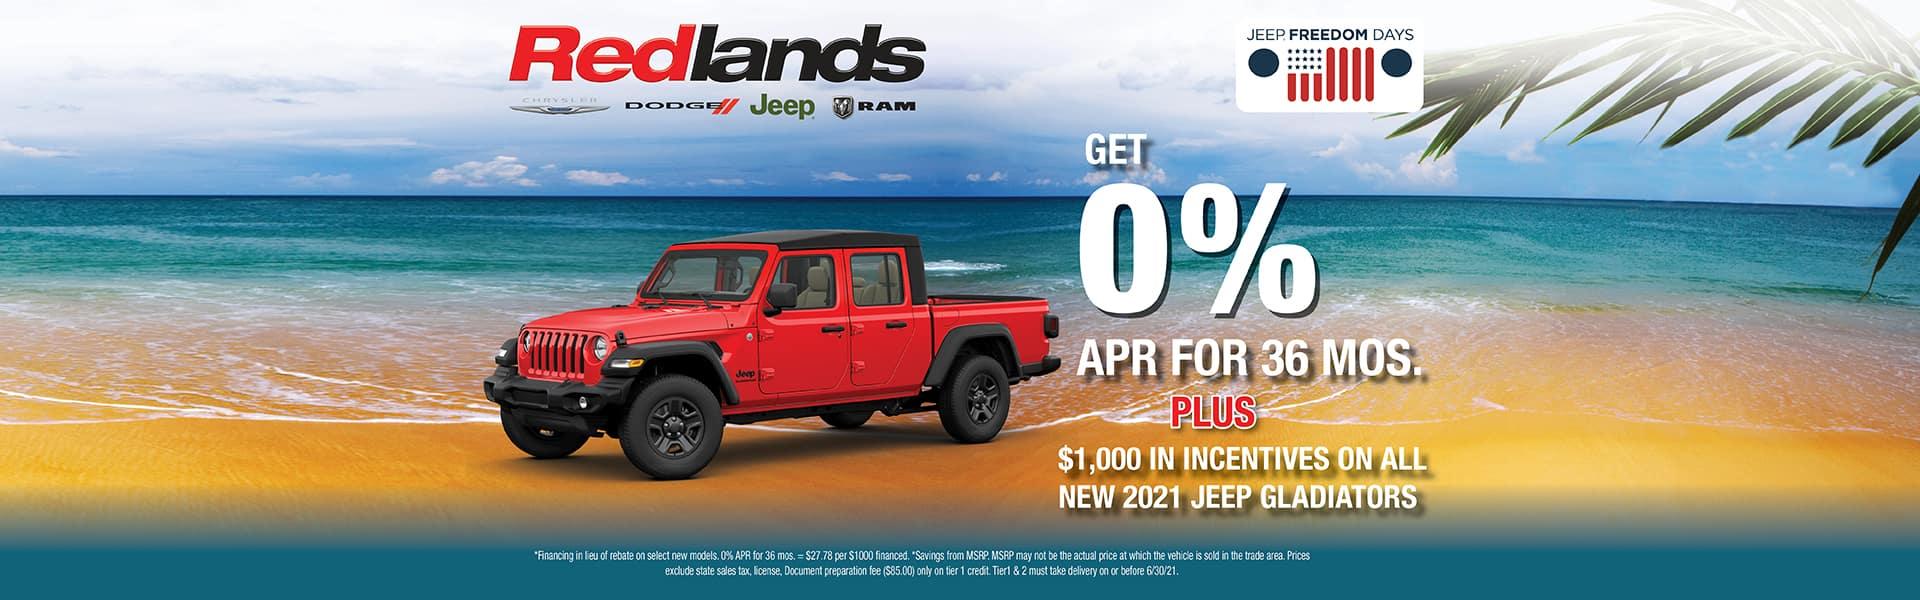 2021 0% Jeep Gladiator | Redlands CDJR